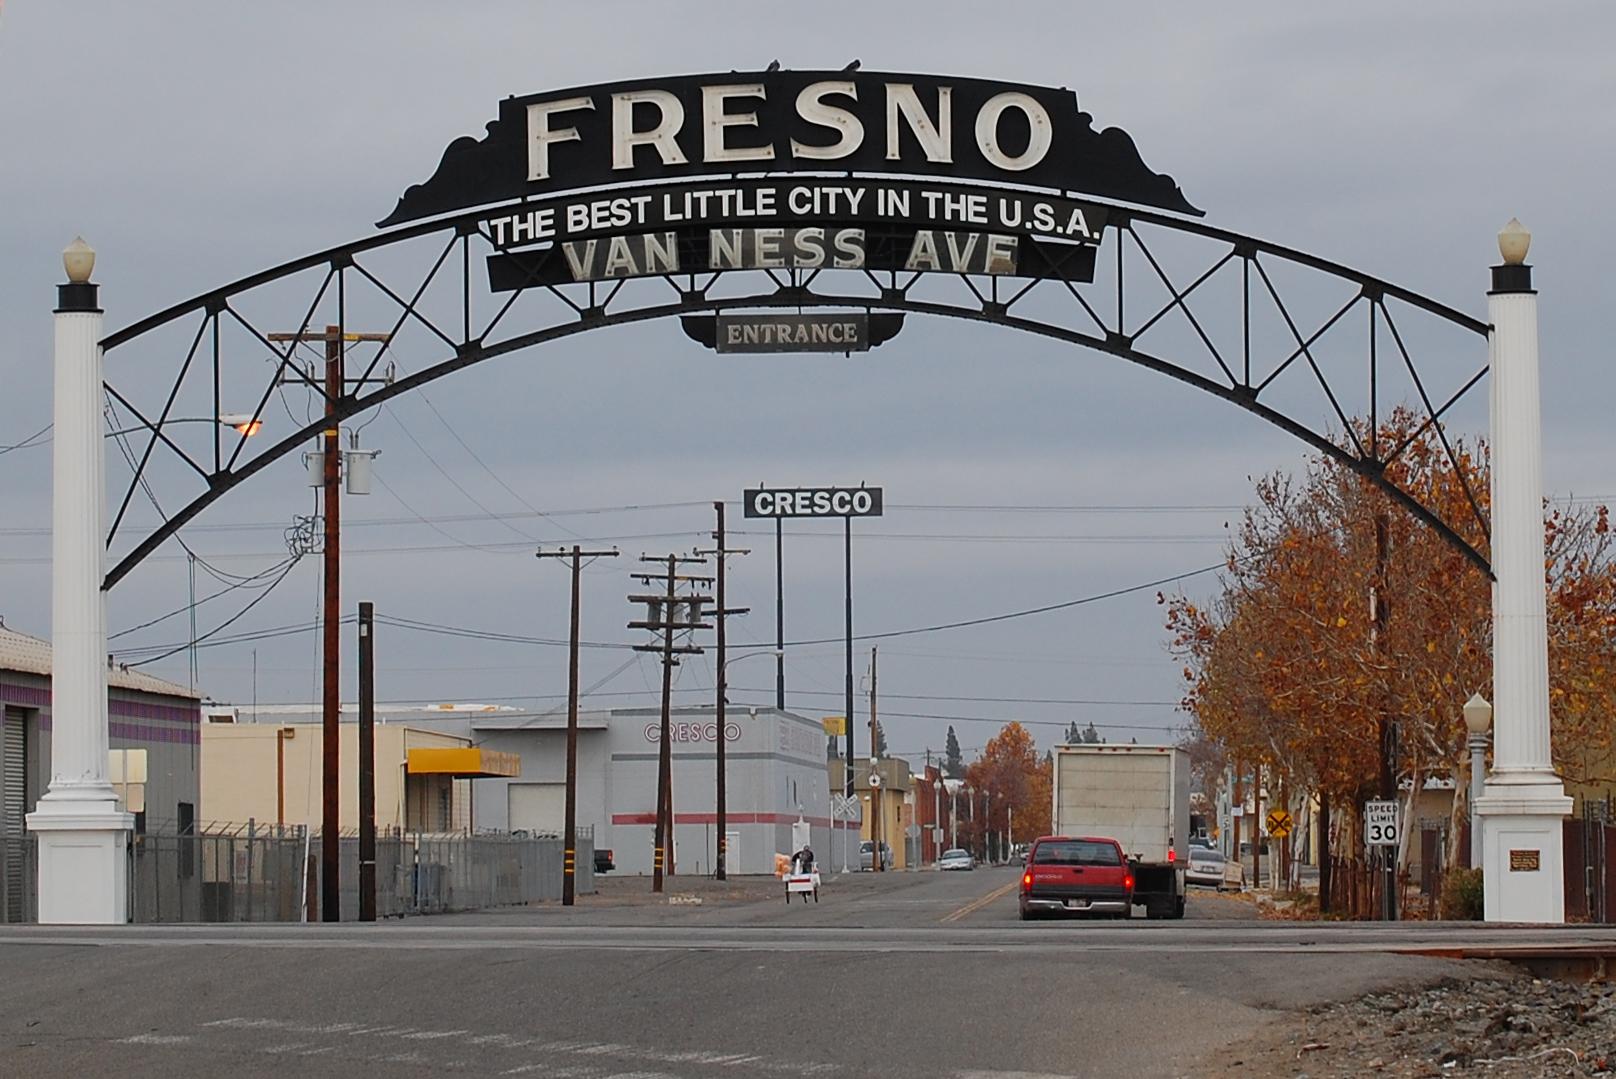 16 Best Bars in Fresno 2016